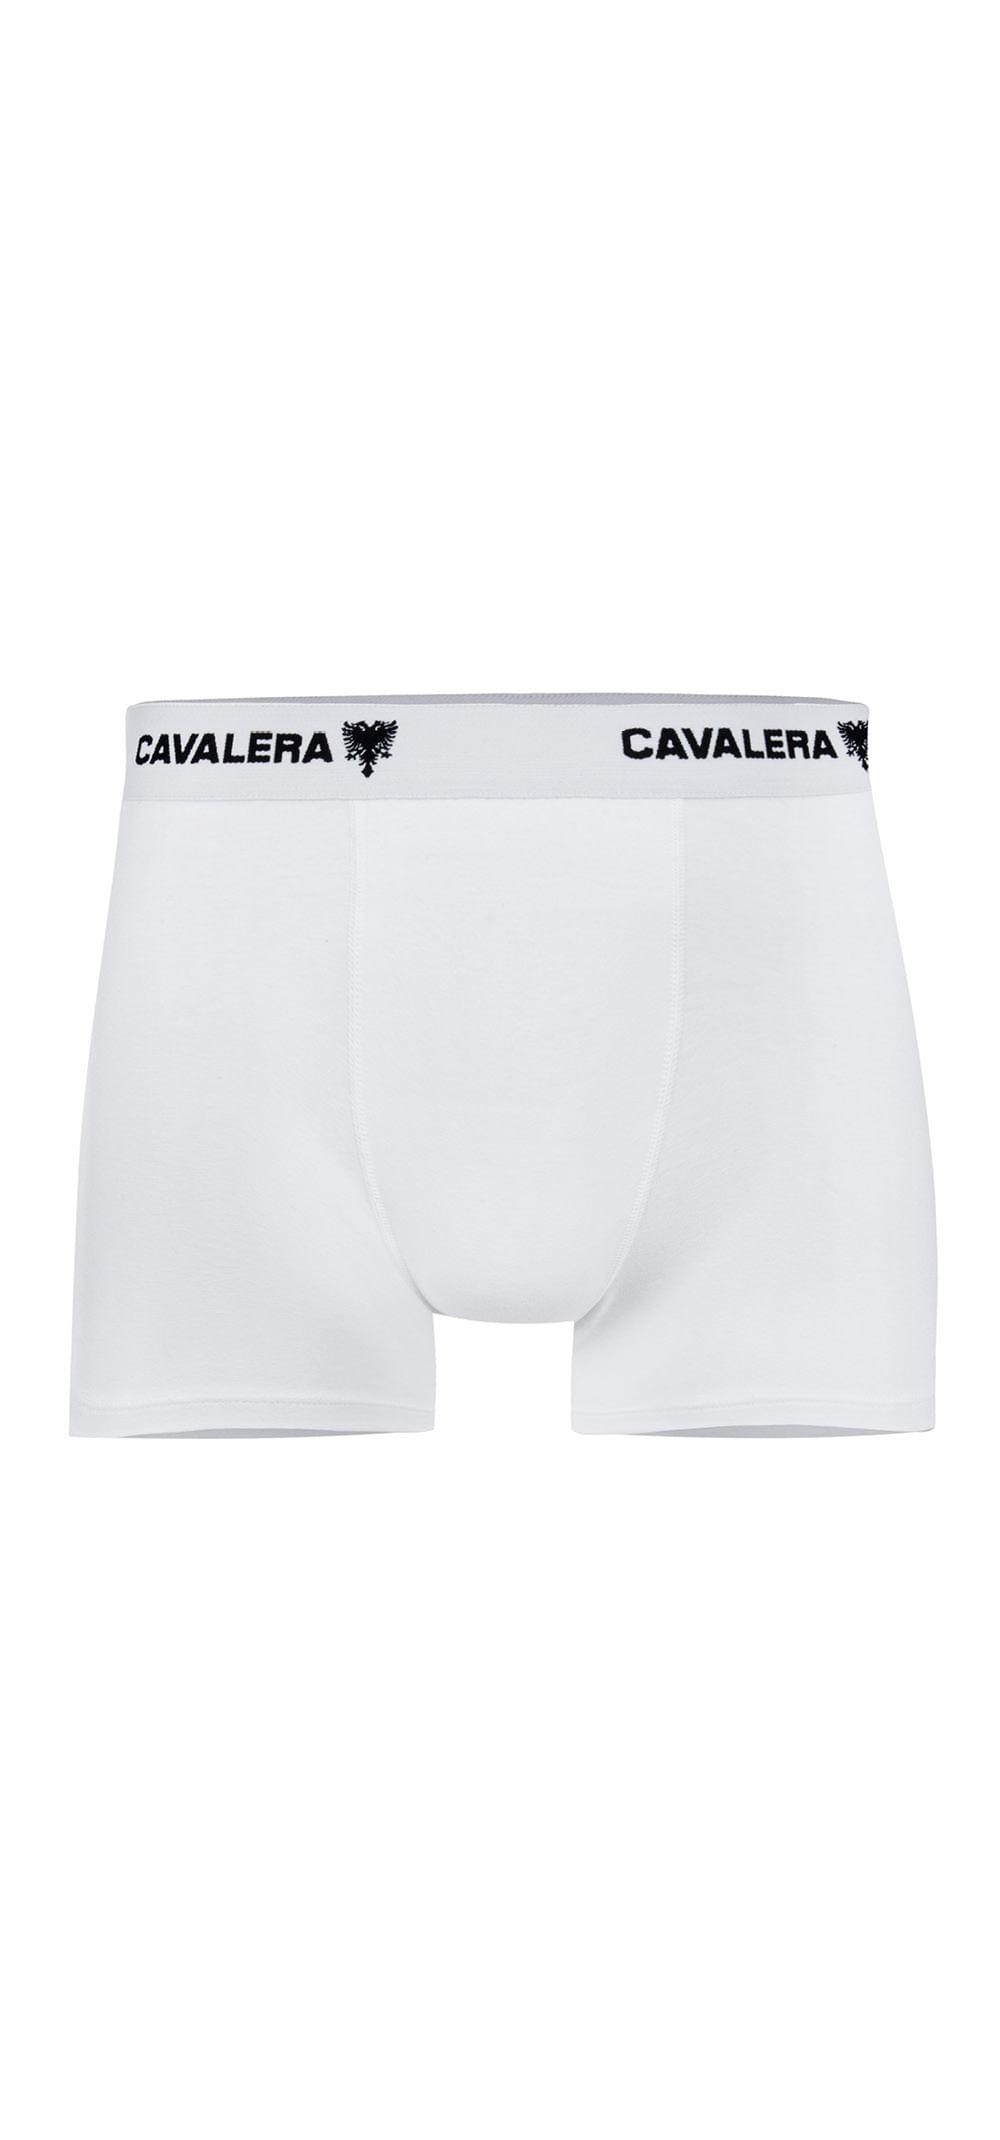 e5a82ecd47cb50 CUECA BOXER BASIC CAVALERA - Trifil